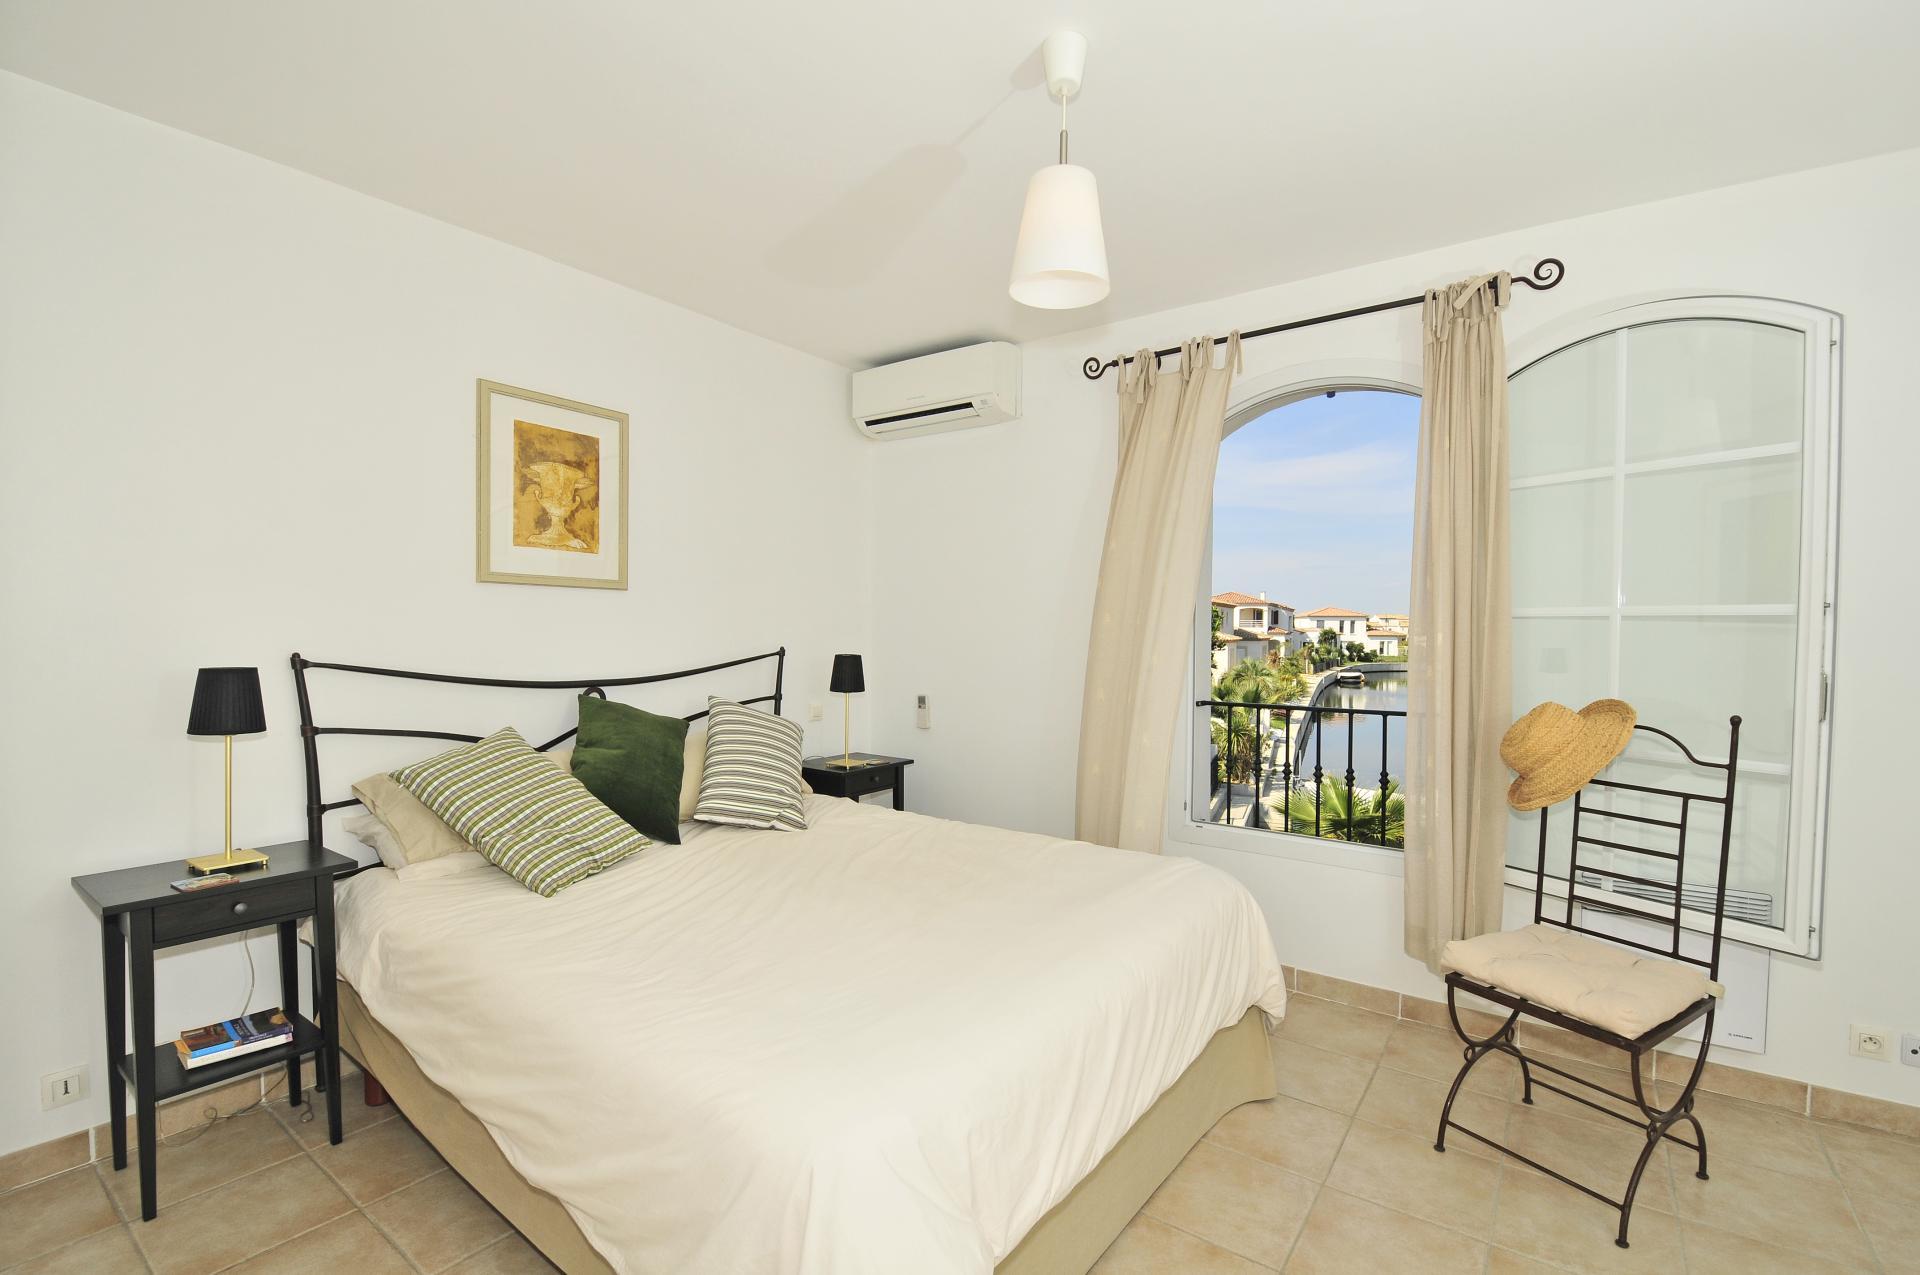 Bedroom 1, La Maison Occitane, Aigues Mortes, Provence.